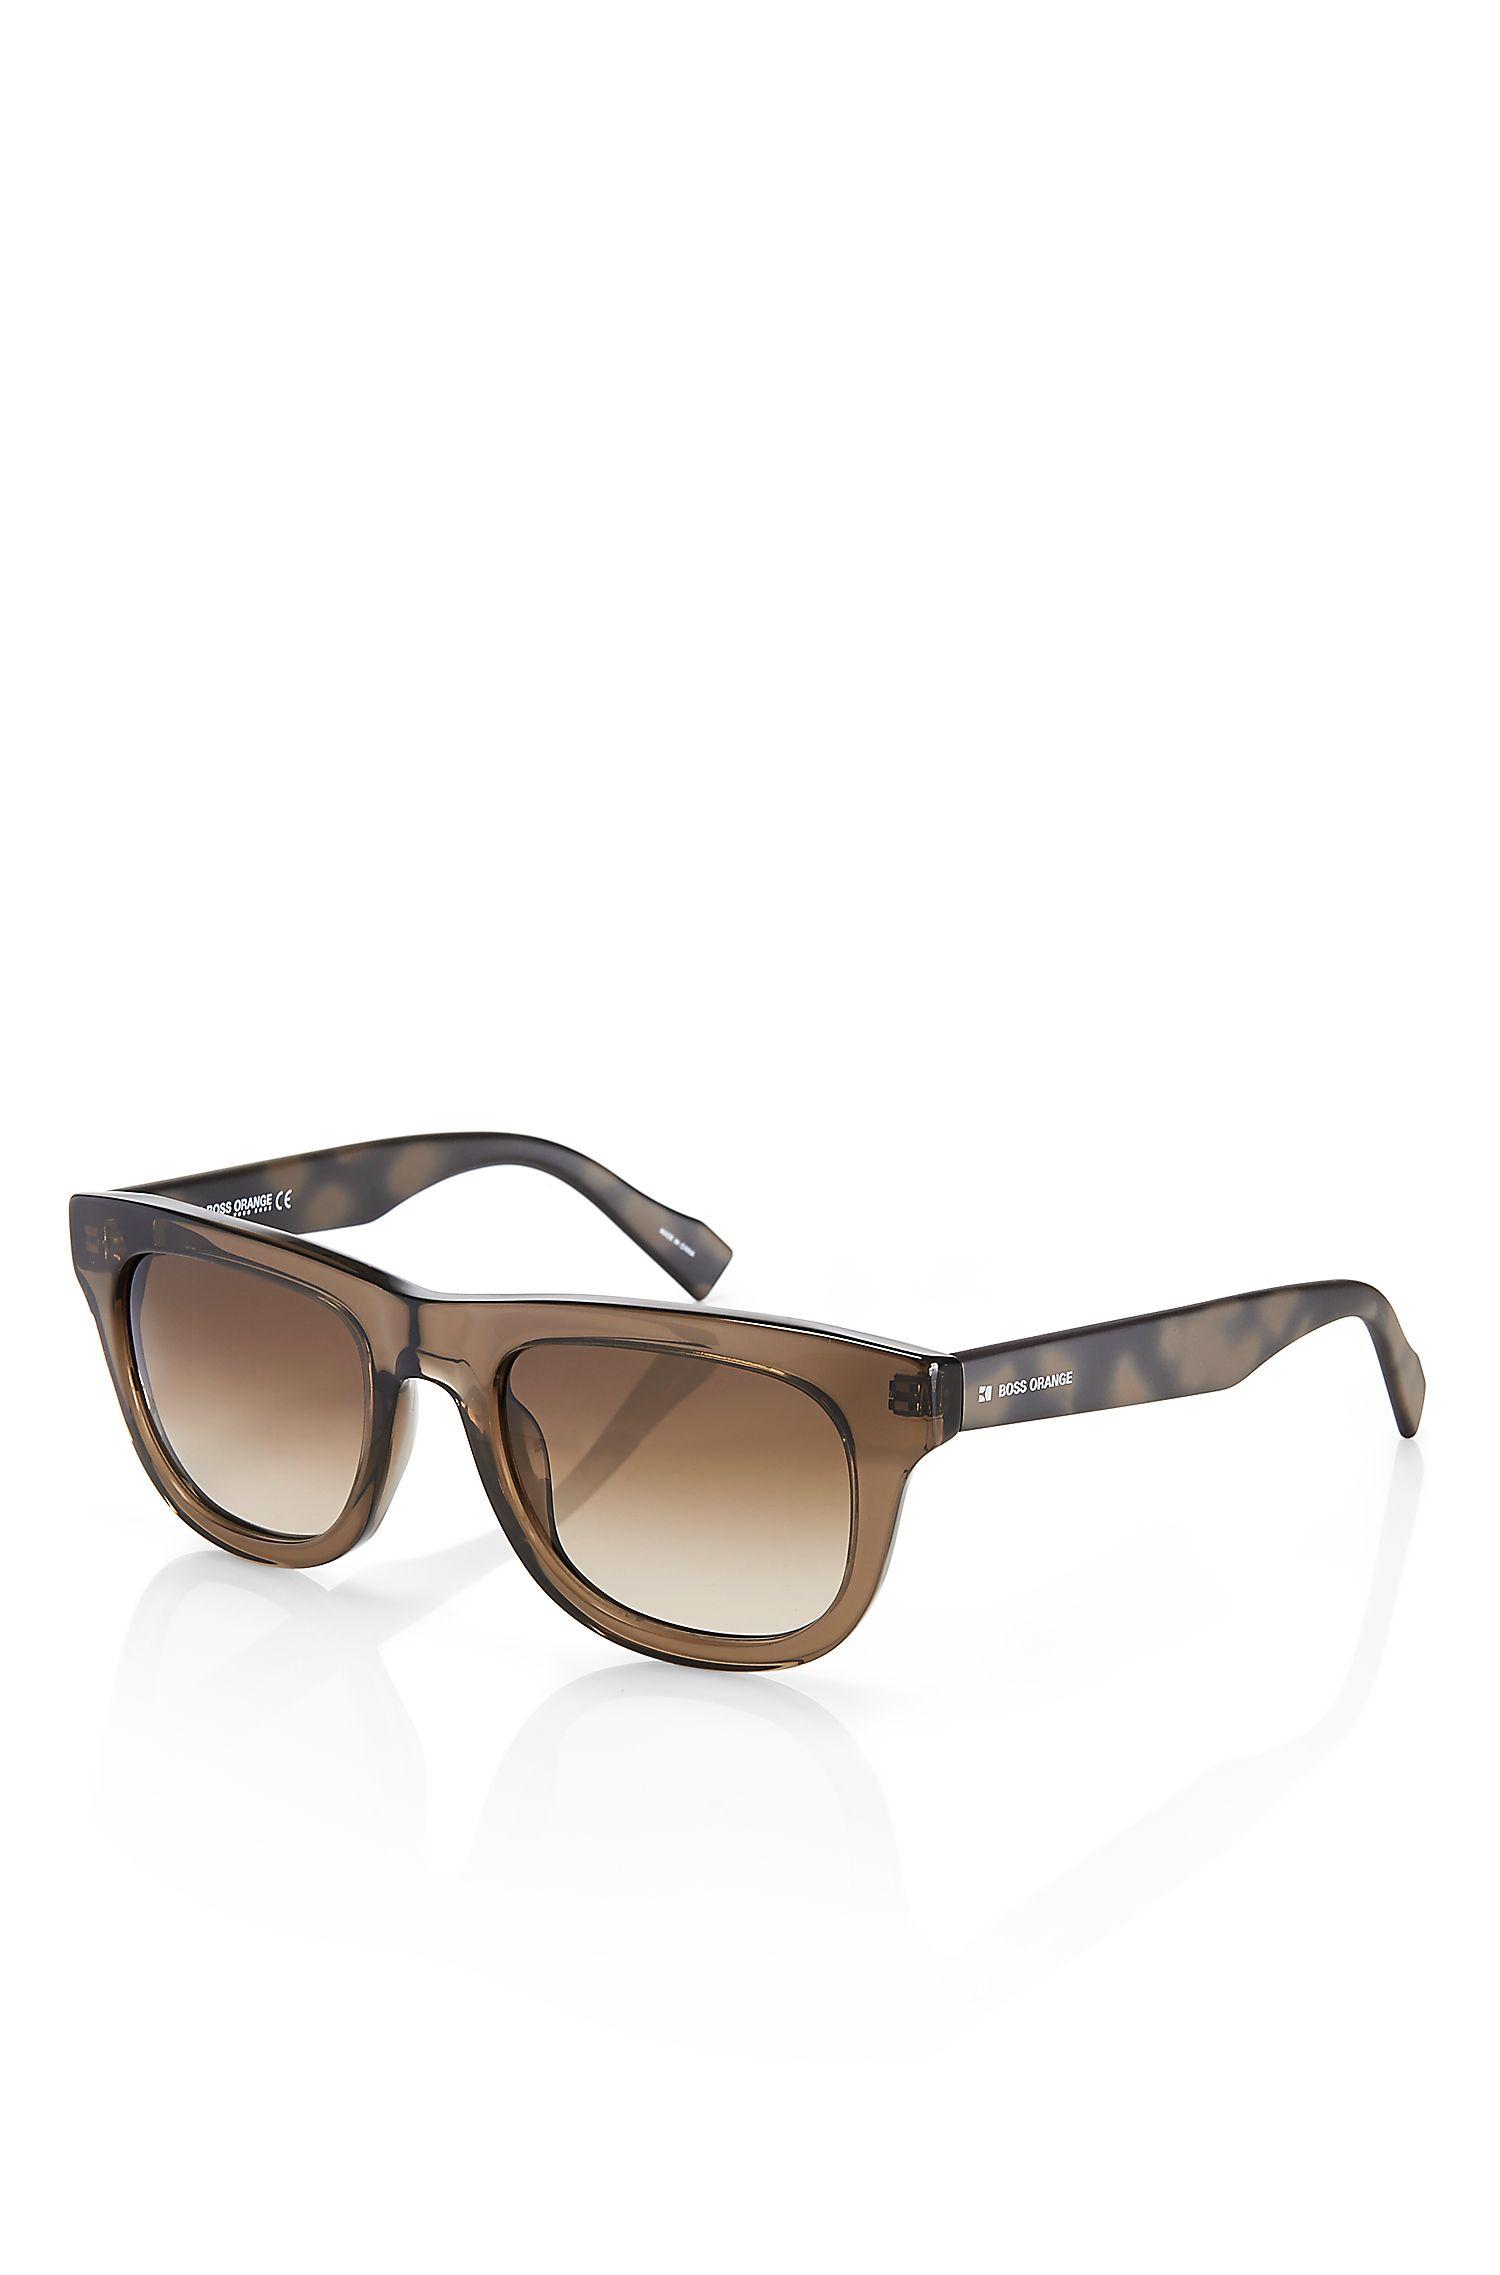 'Sunglasses ' | Plastic Splash Color Frame Sunglasses